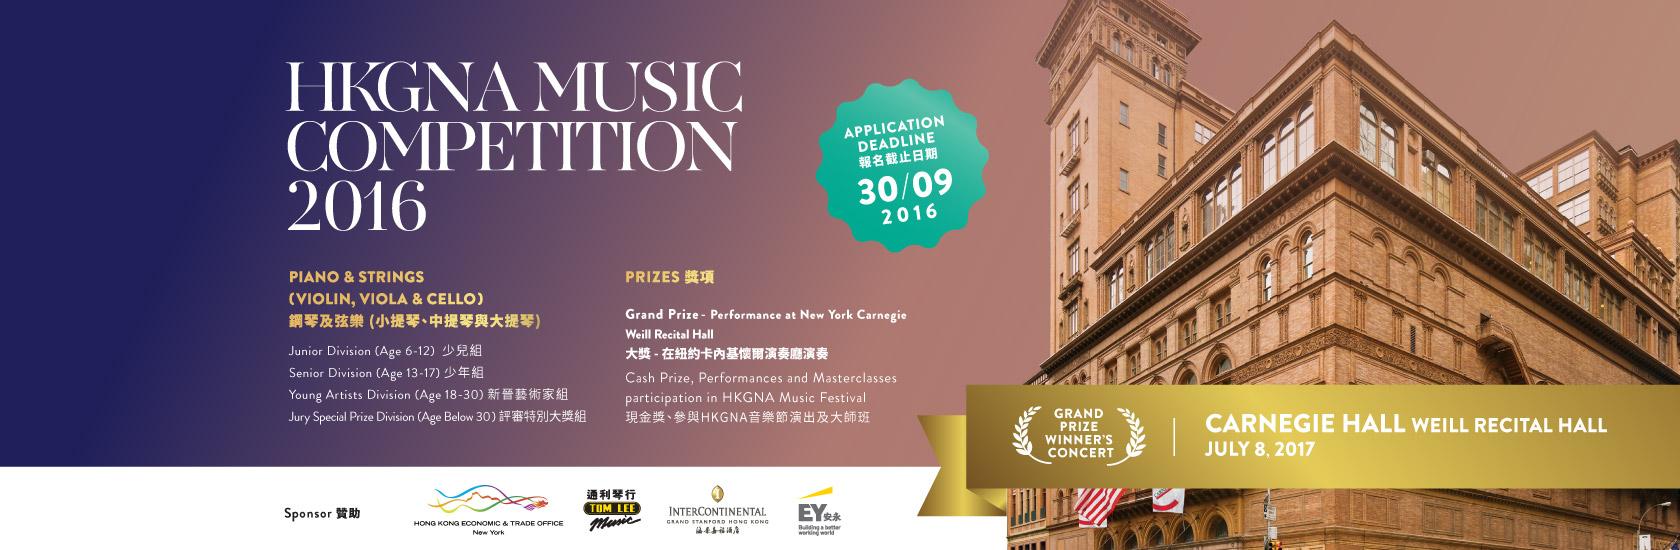 music-comp-banner2